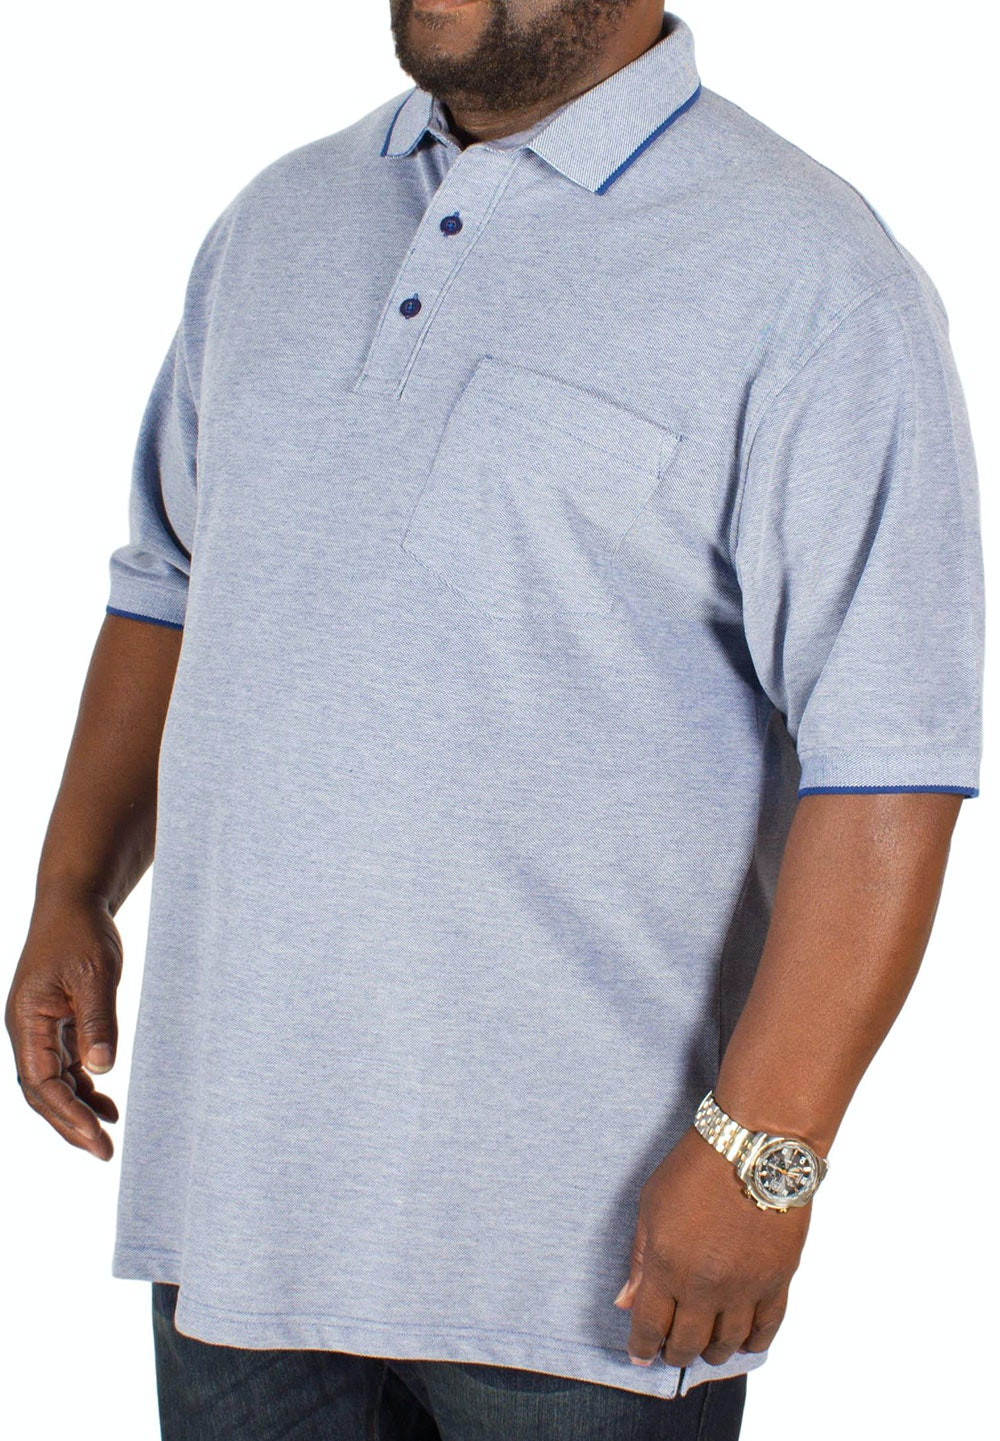 Bigdude Marl Effect Pocket Polo Shirt Blue